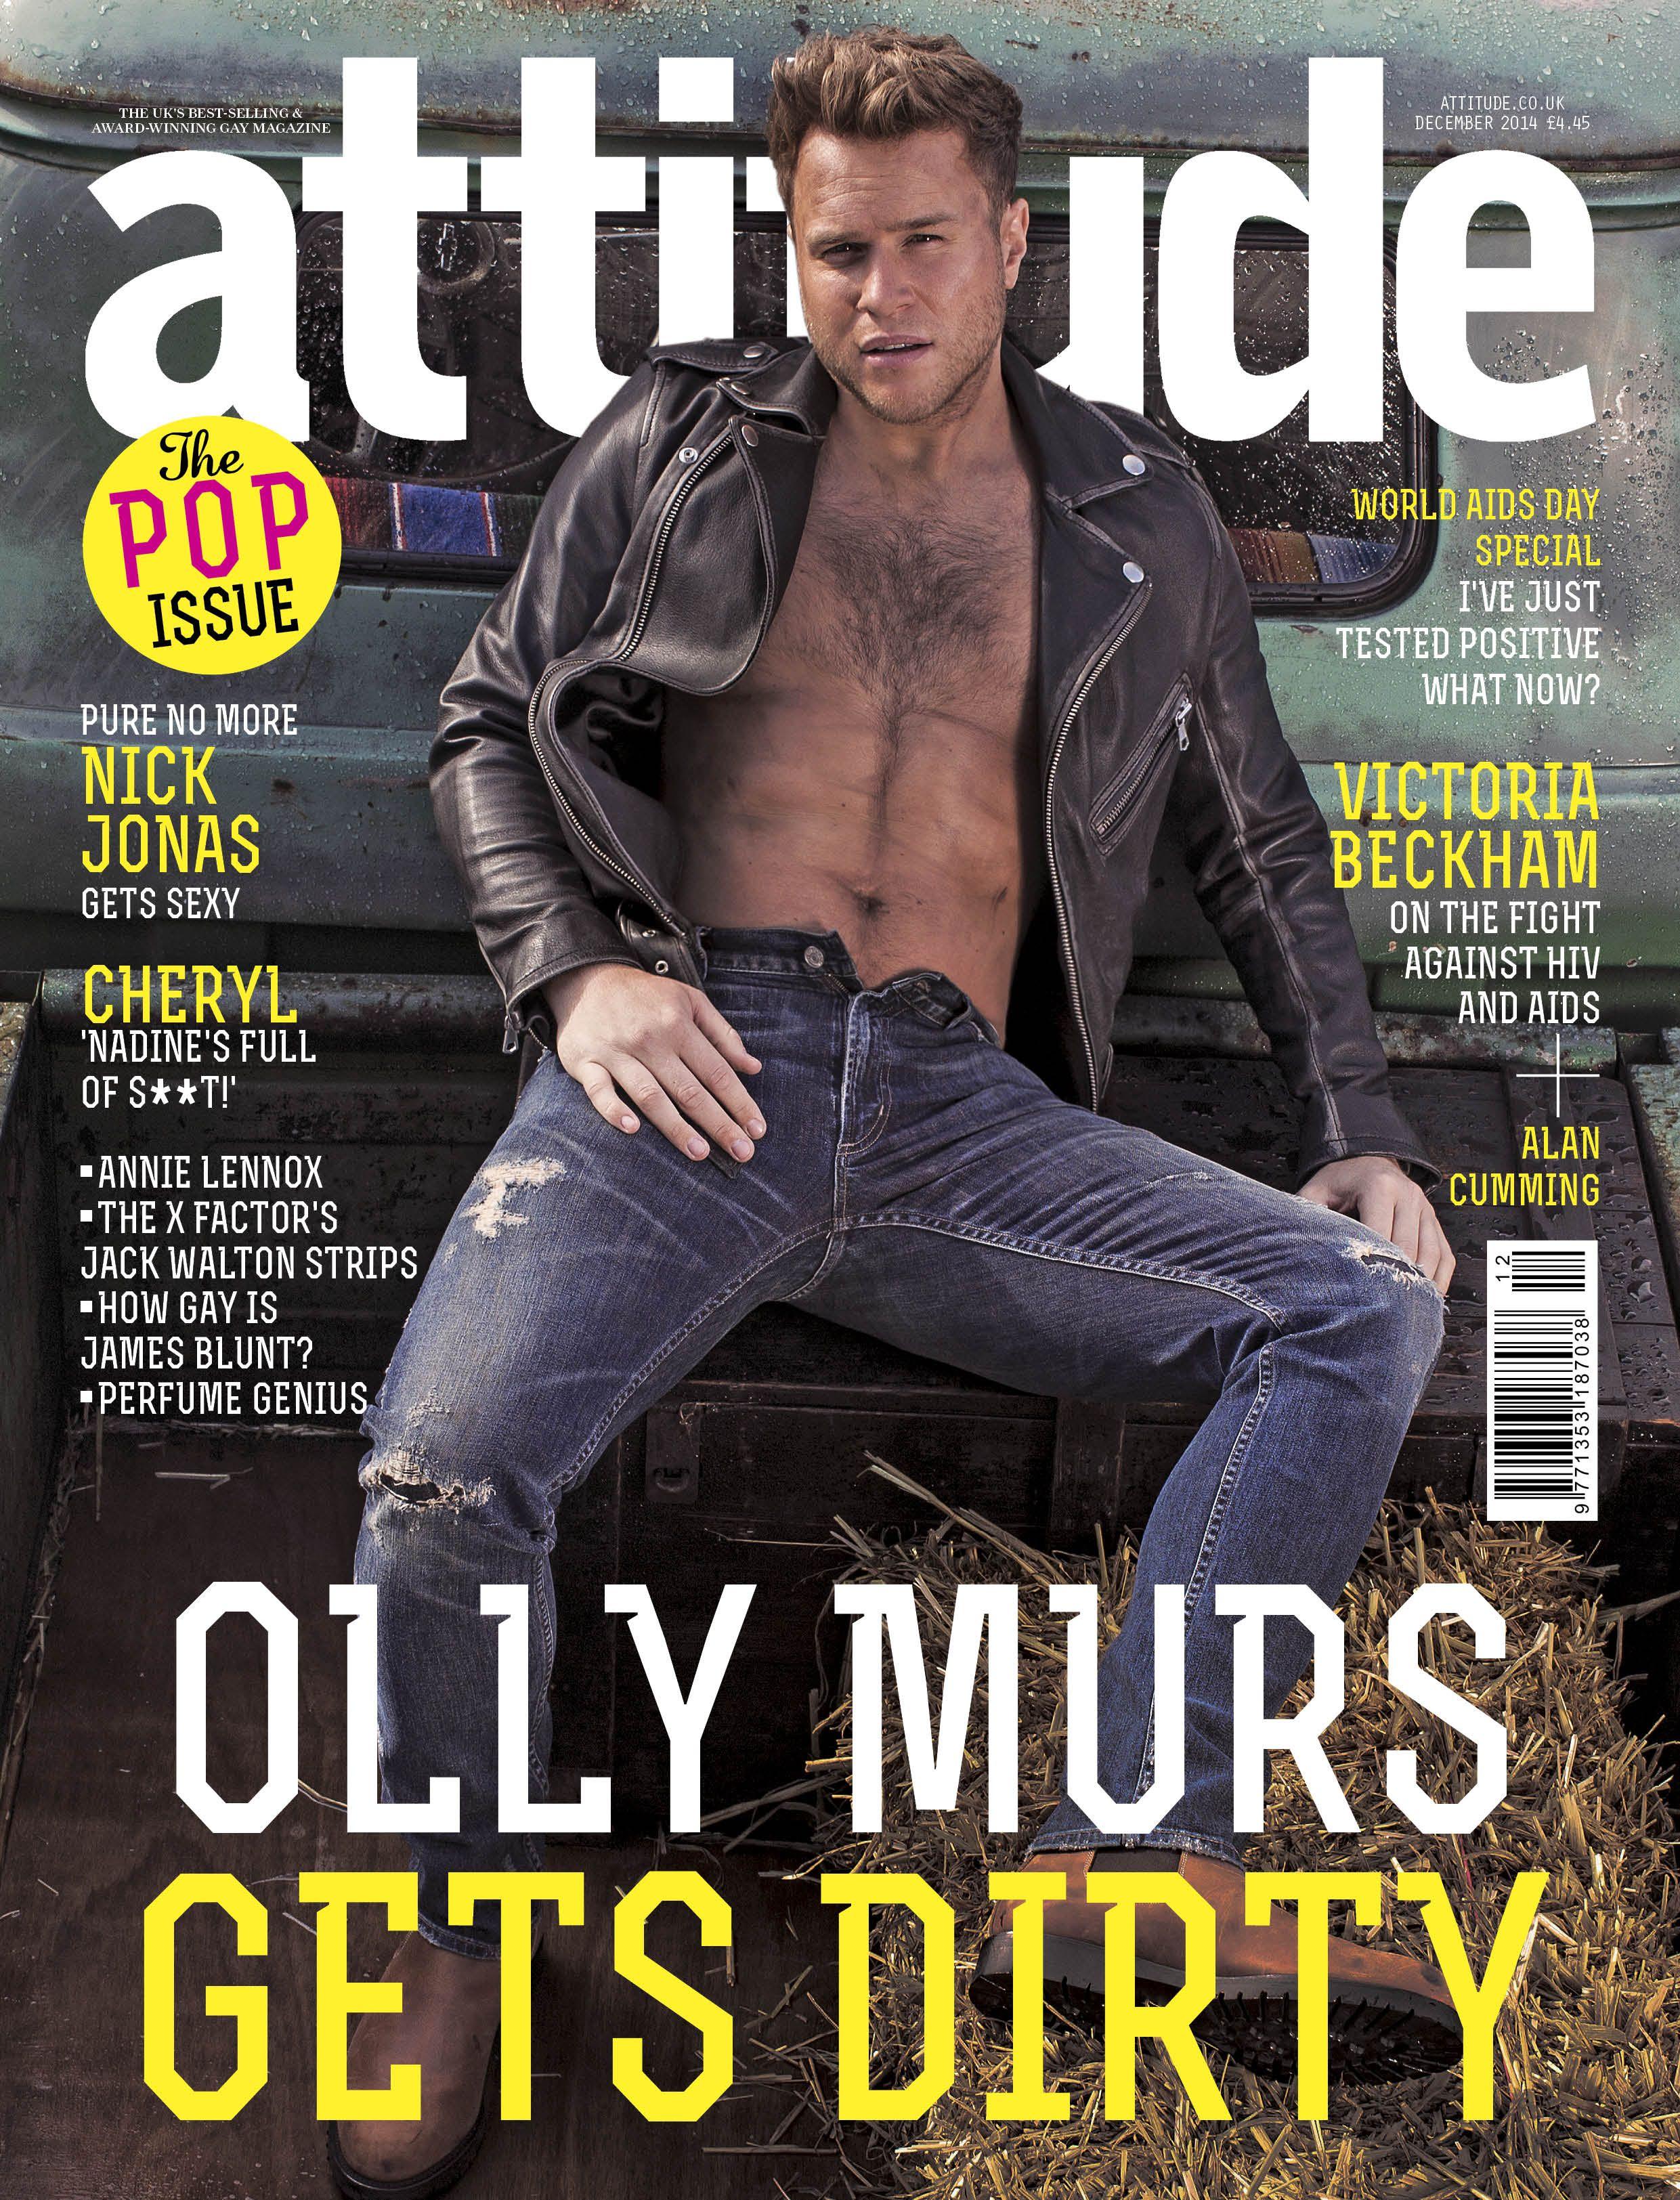 Olly murs black t shirt x factor - Att251_001_cover_300 Olly Murs